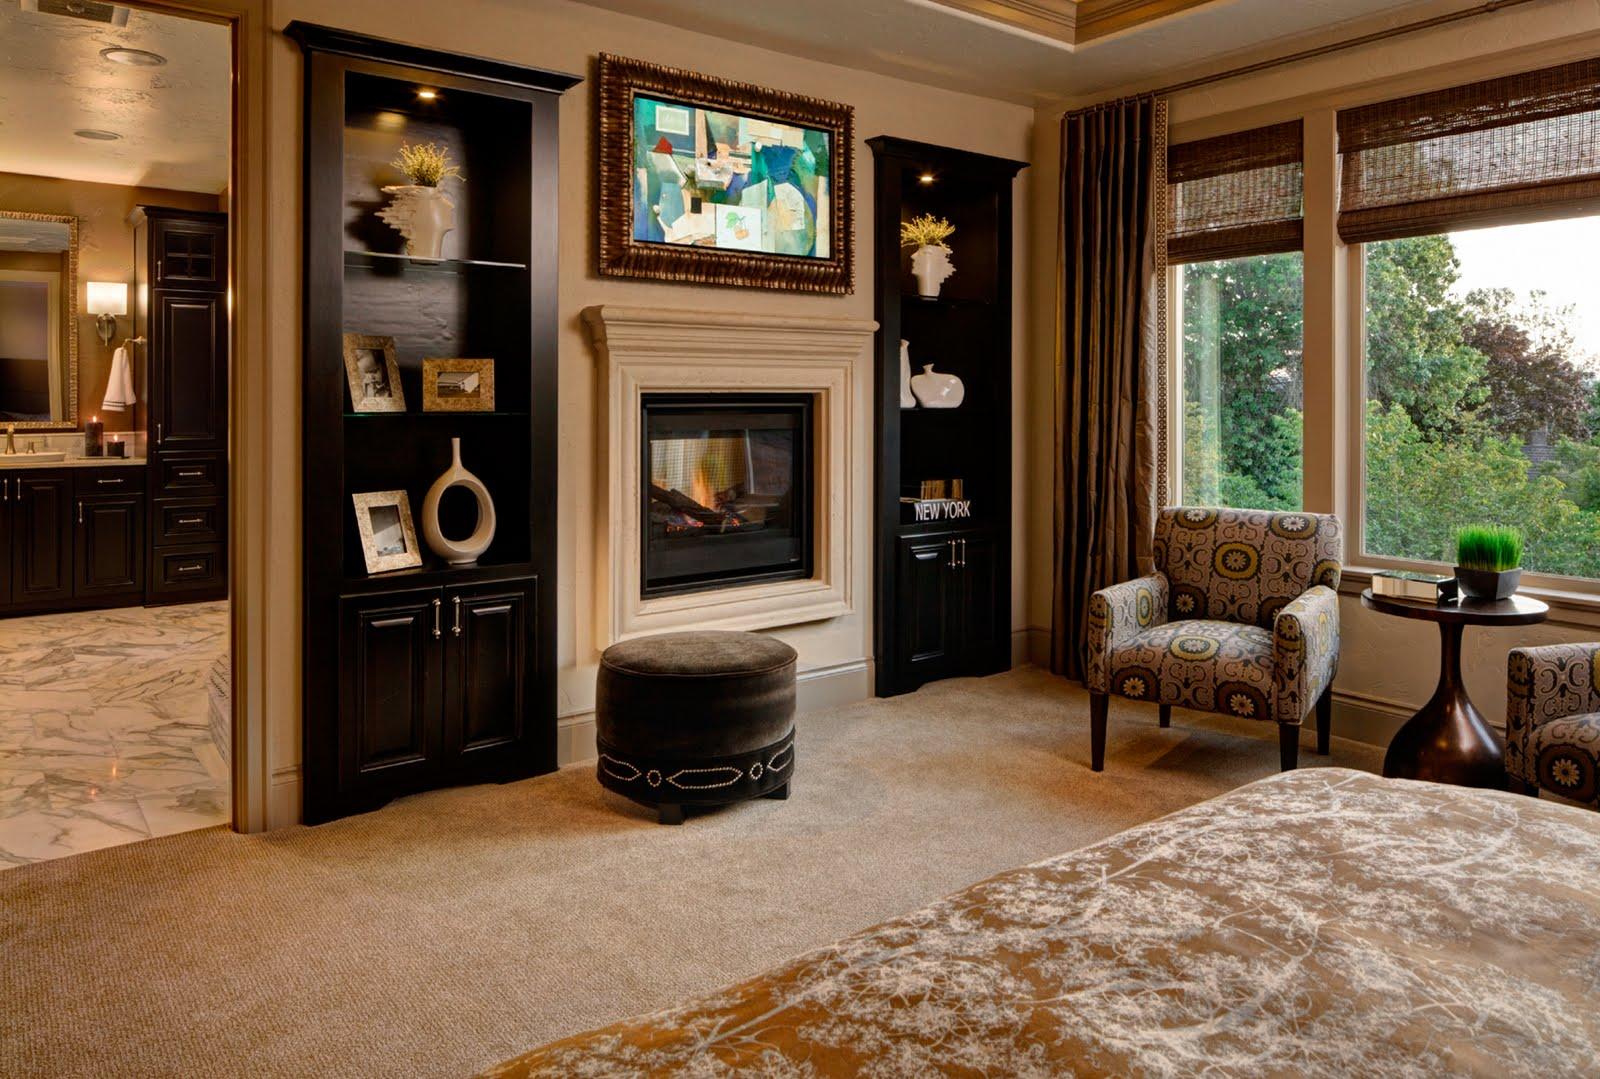 arbor custom homes on bull mountain chateau marseille new photo 39 s. Black Bedroom Furniture Sets. Home Design Ideas